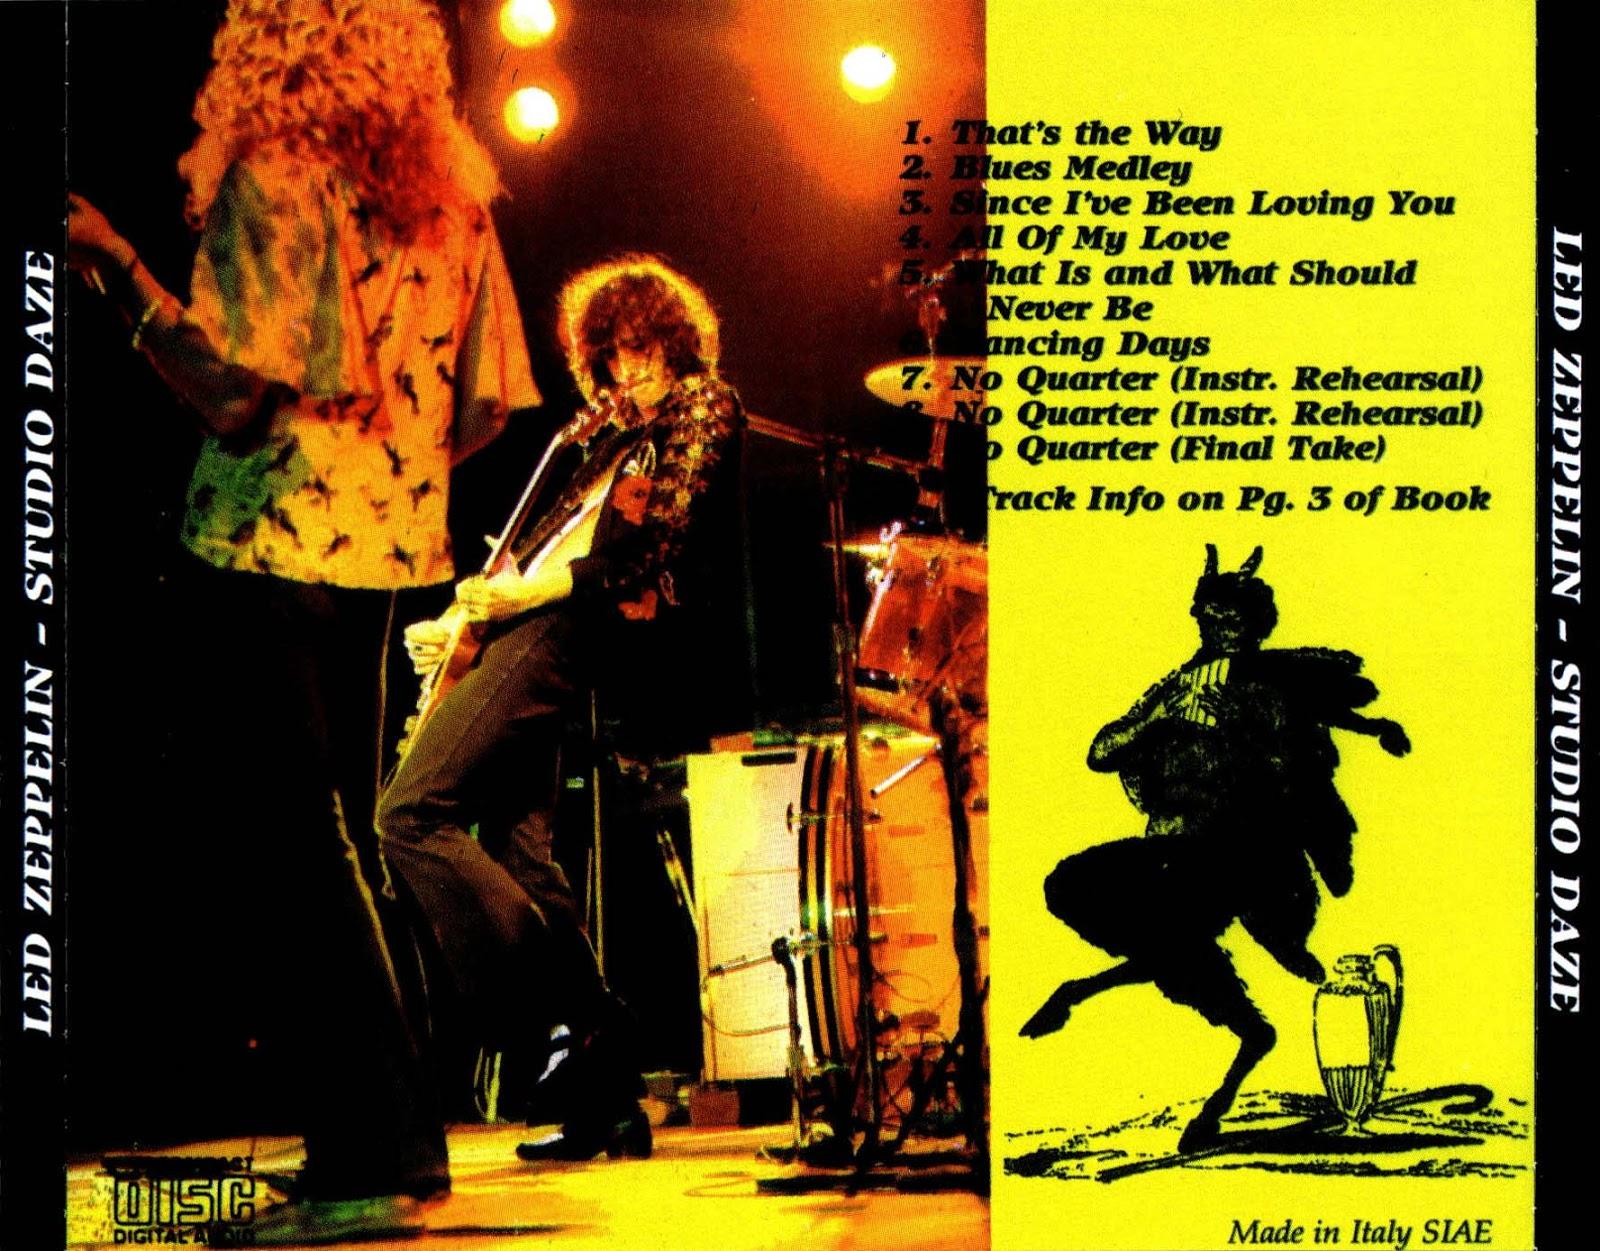 RELIQUARY: Led Zeppelin - Studio Daze (Scorpio) [SBD] FLAC + MP3